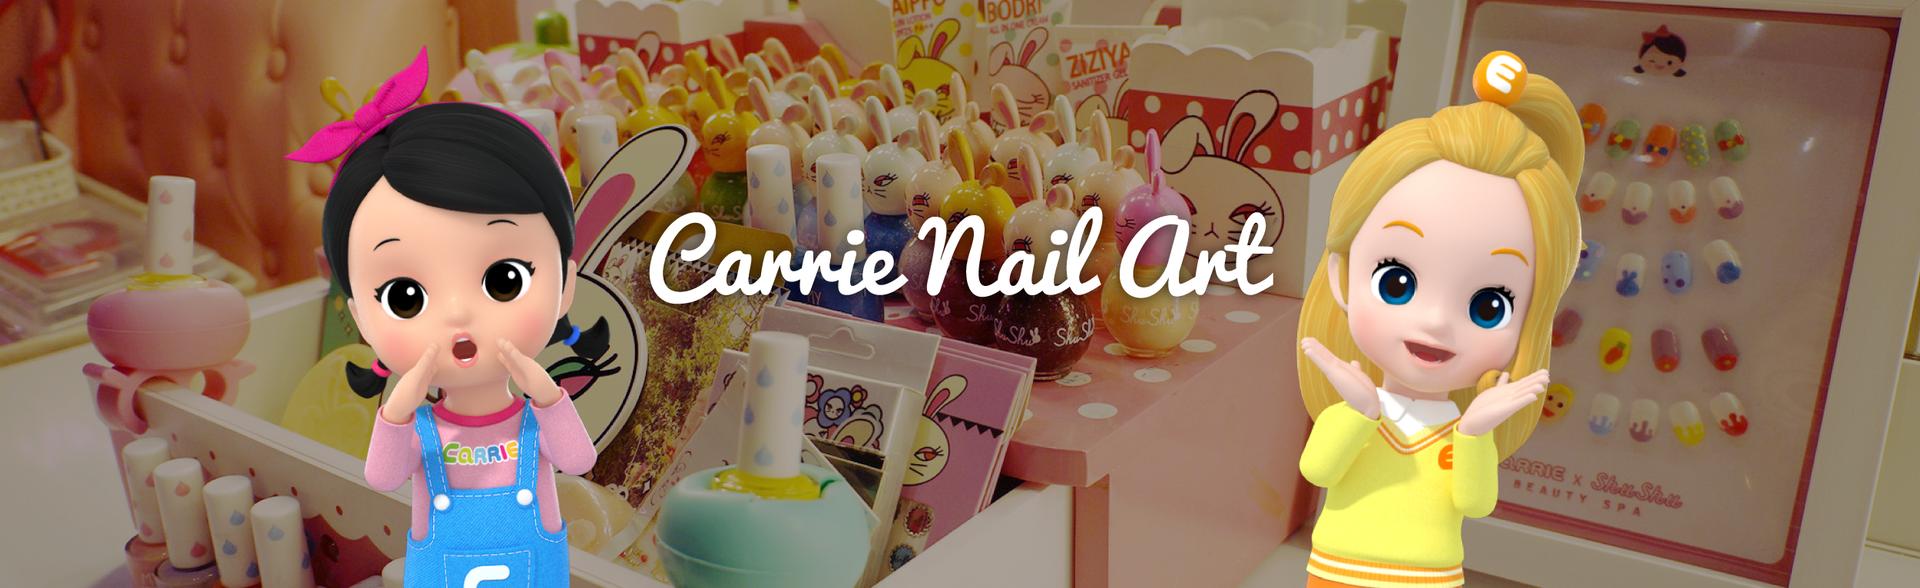 CARRIE NAIL ART